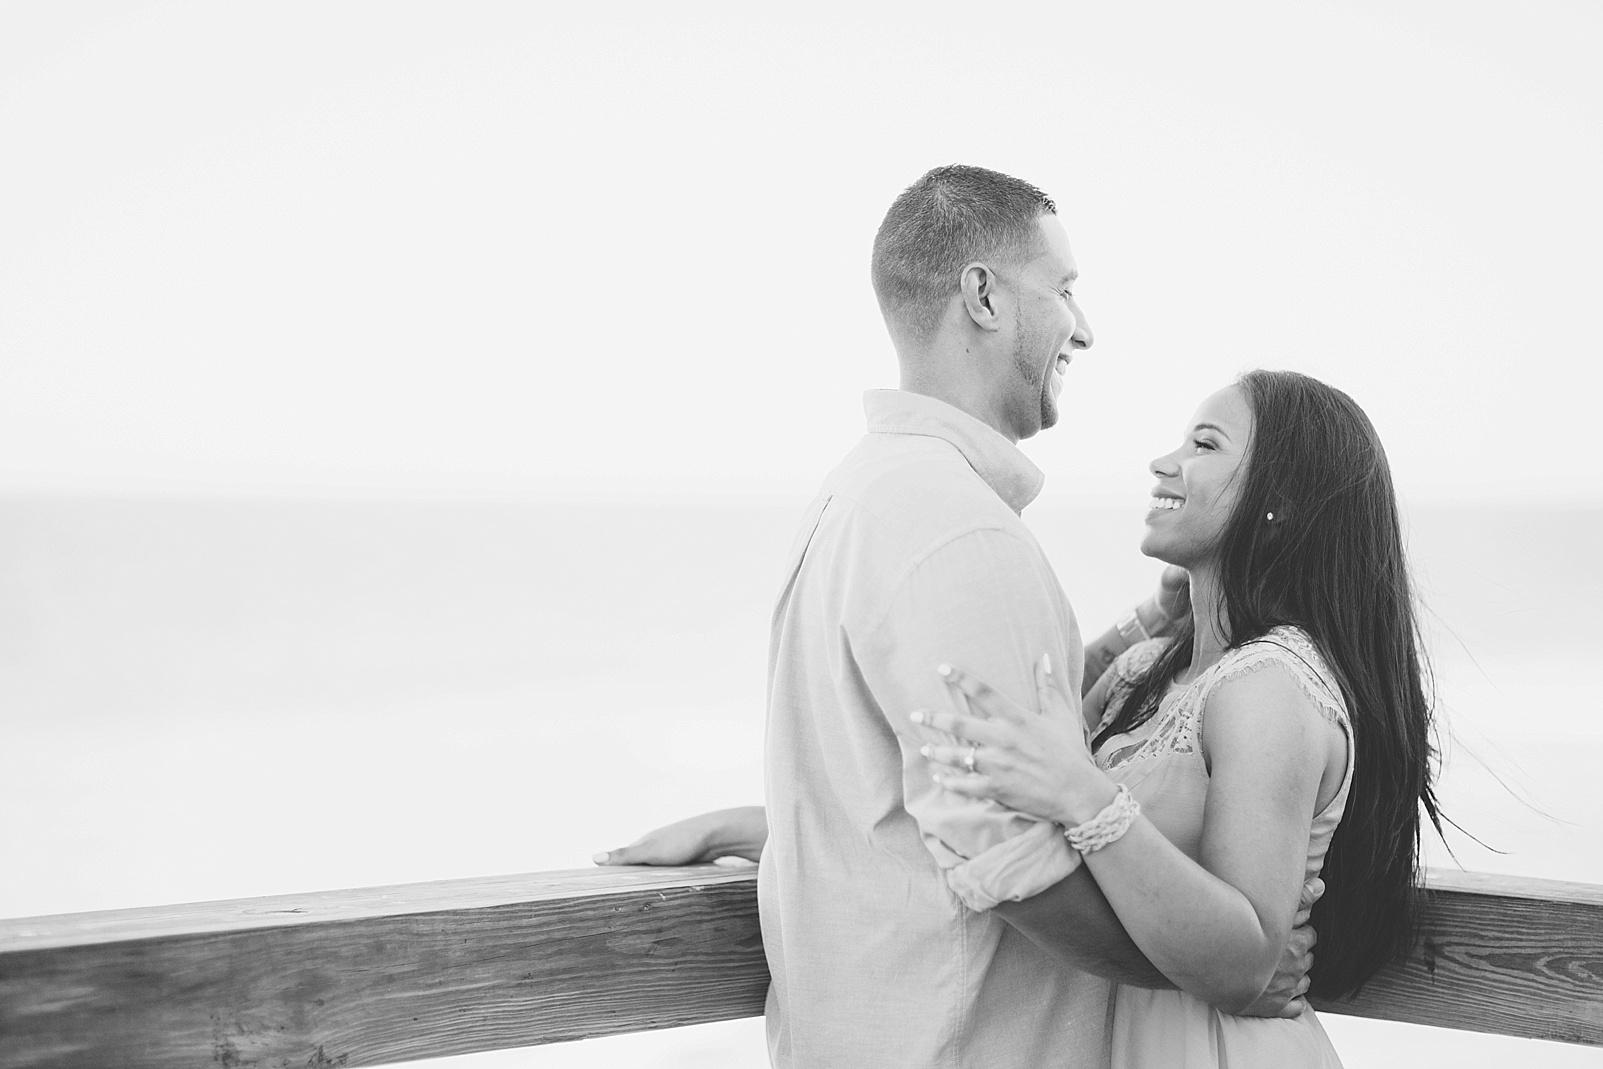 daytona-beach-engagement-shoot-ariel-2